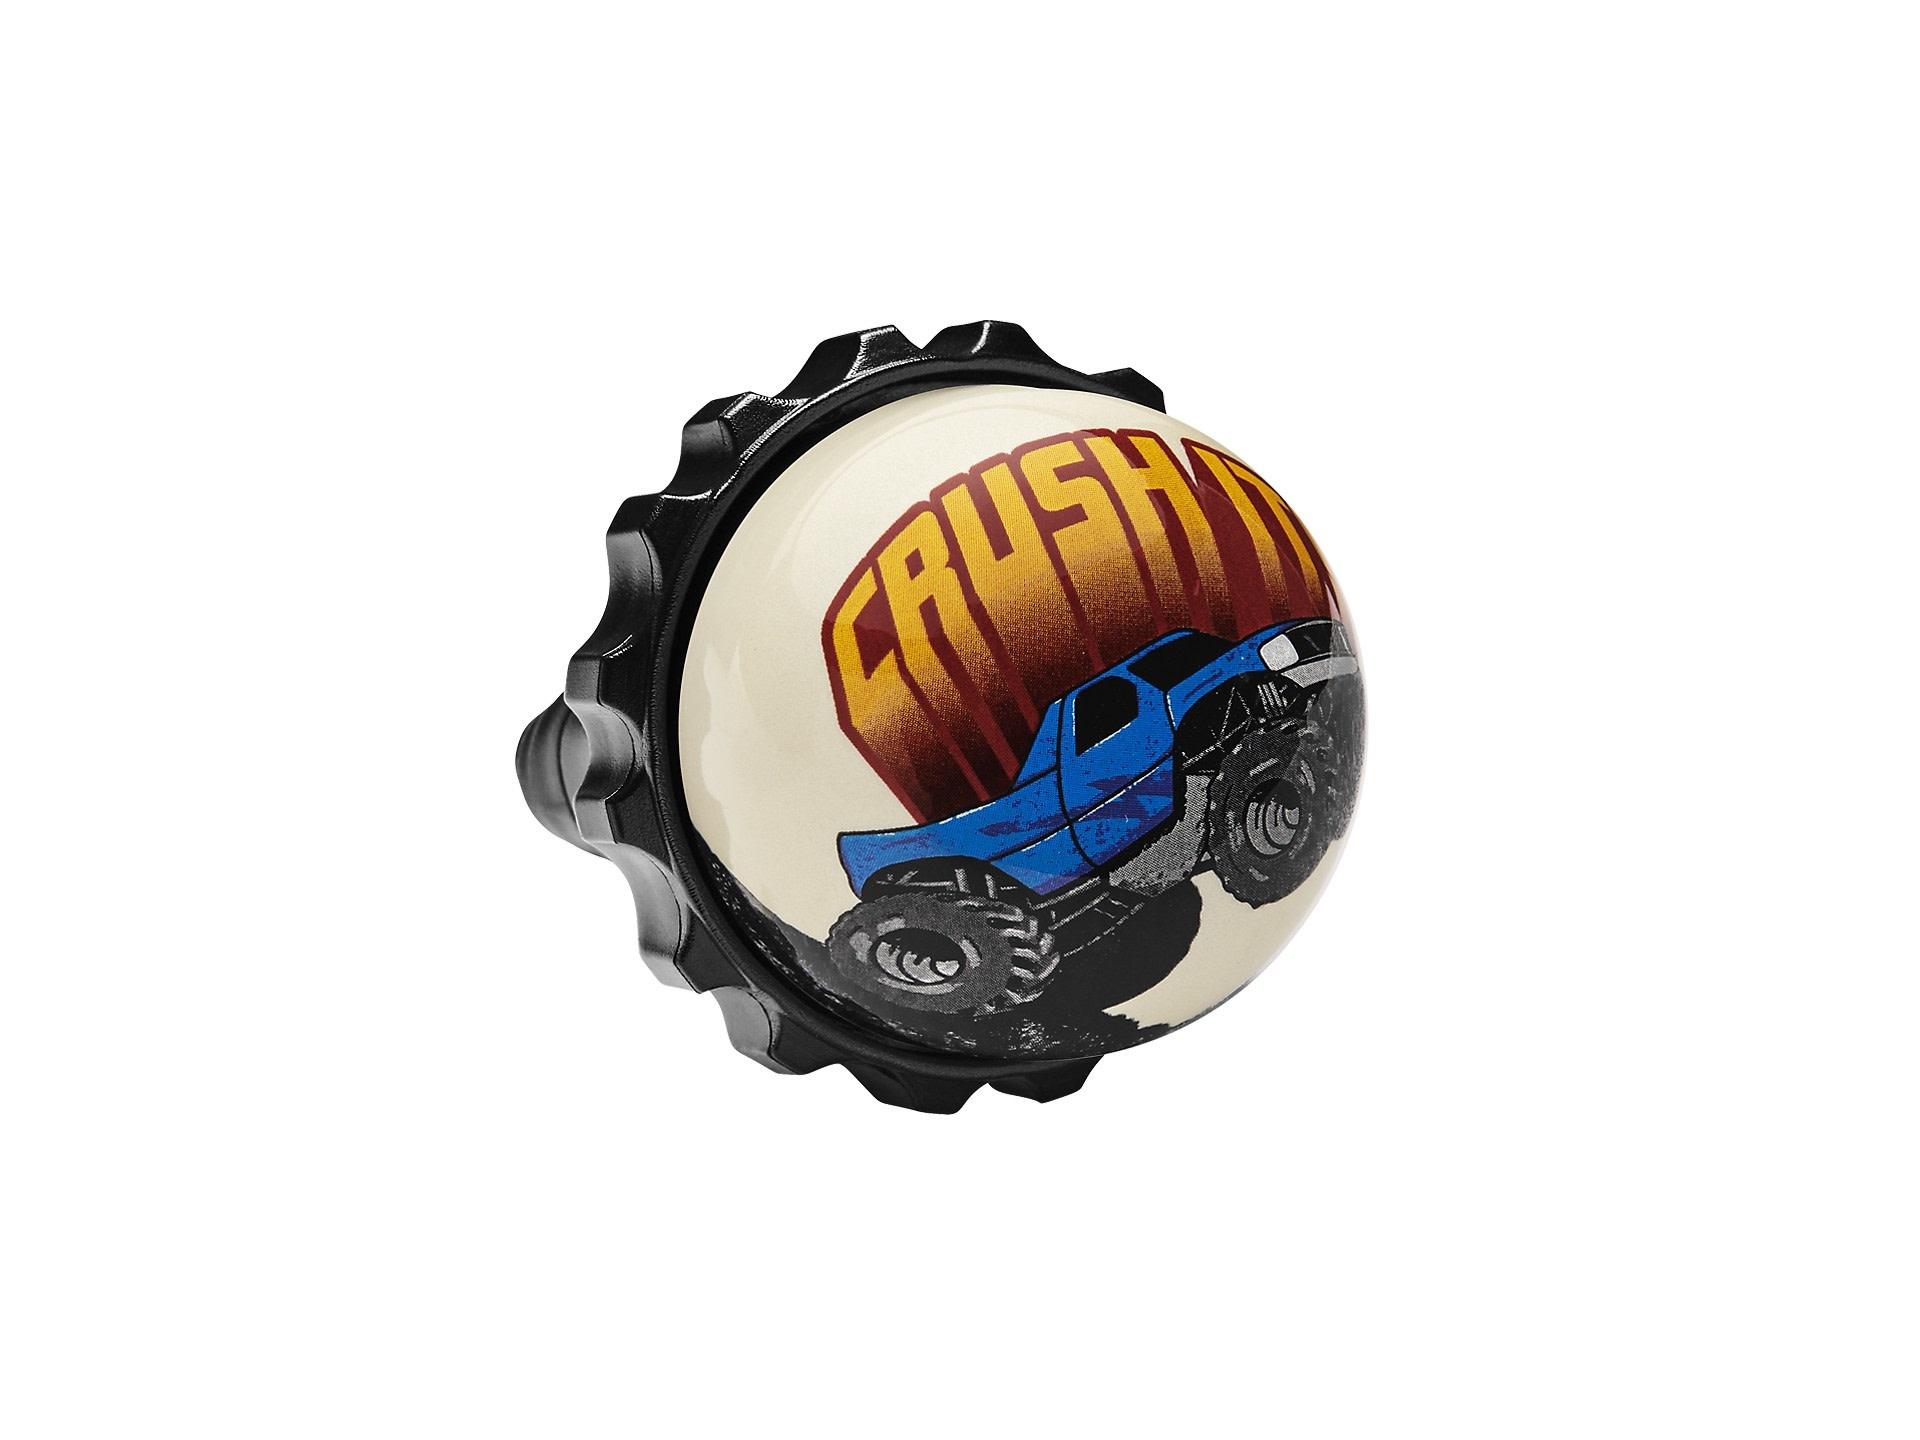 Electra Electra Crush It! Twister Bike Bell